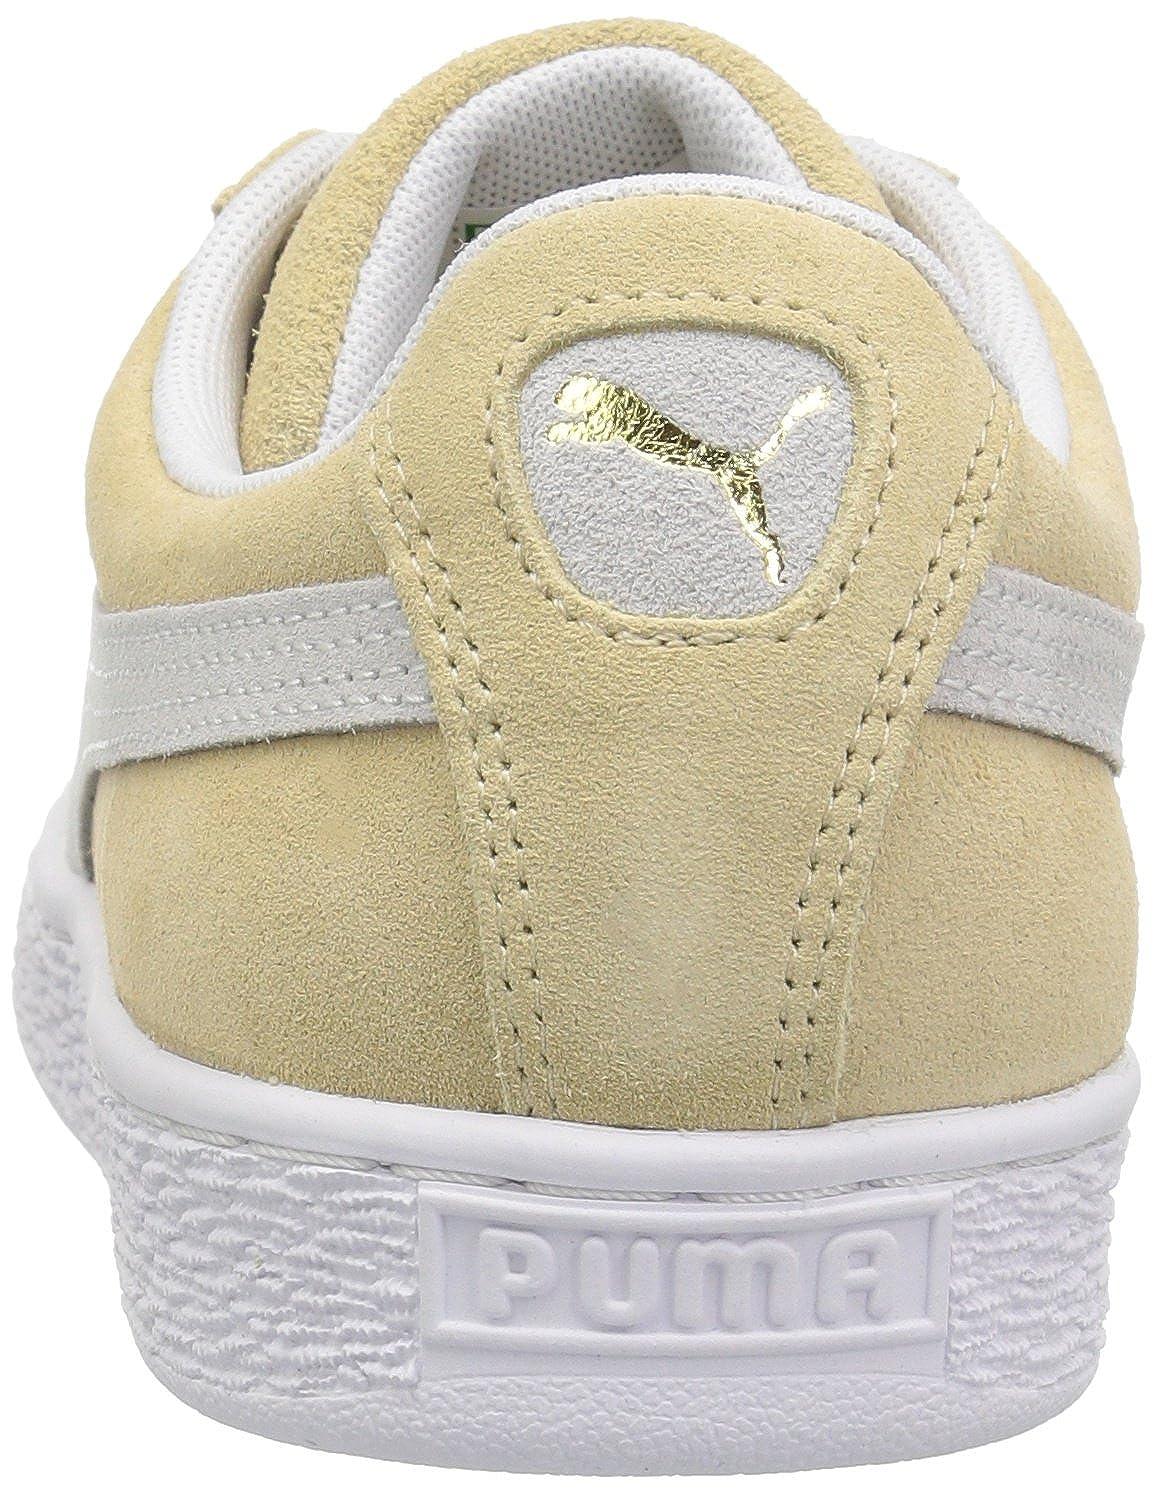 Puma Men's Suede 90681 Honey Mustard White Ankle High